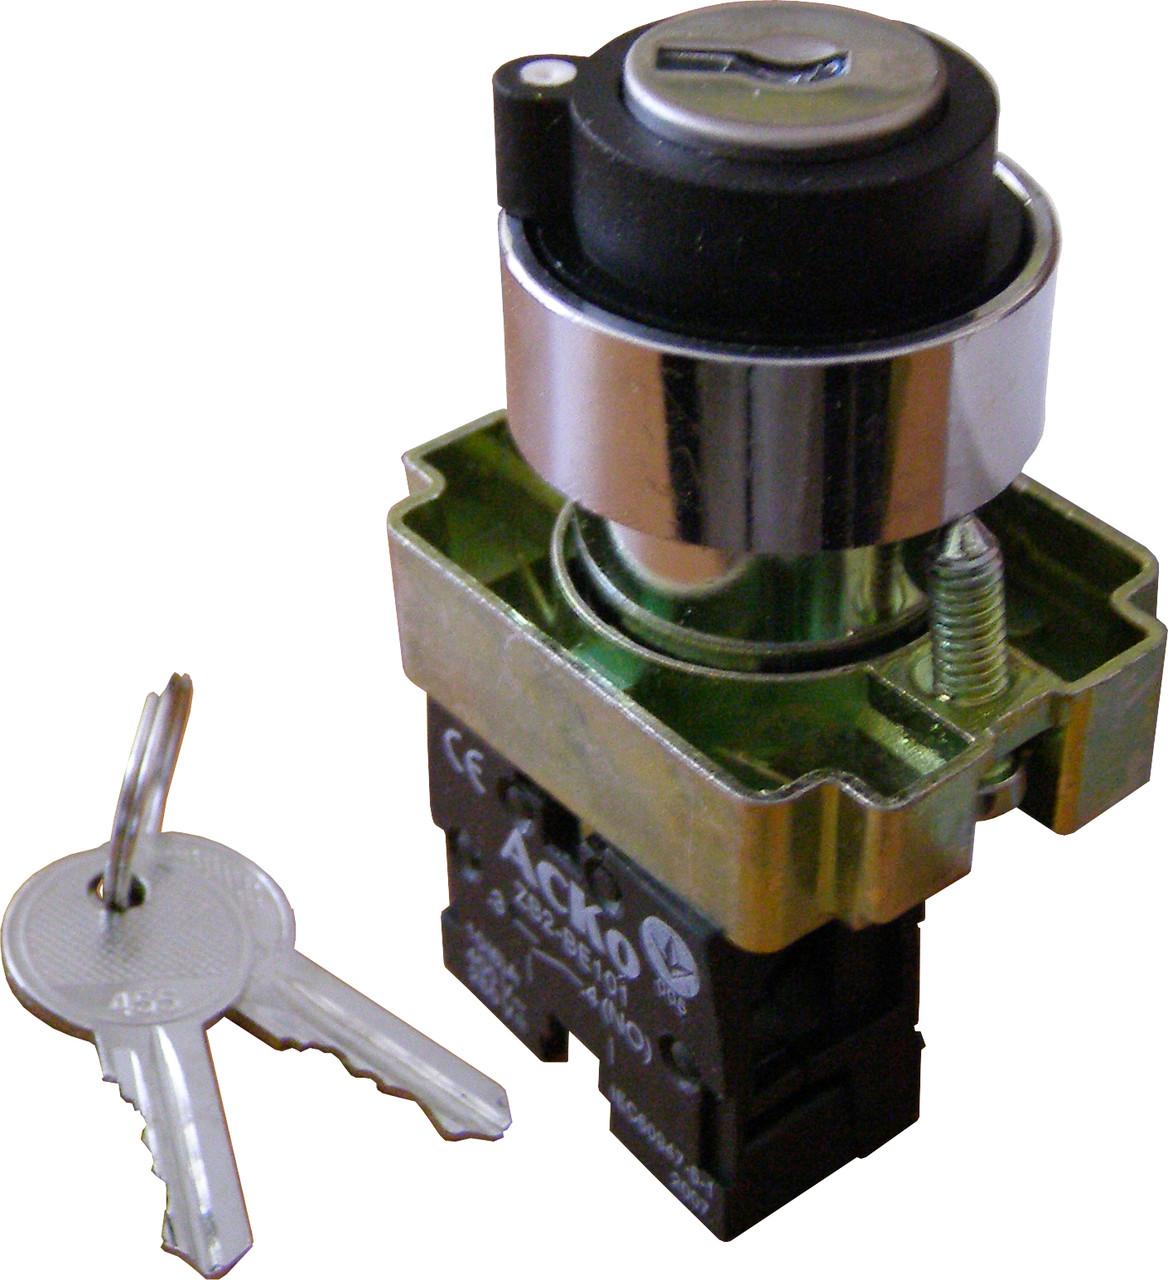 Кнопка поворотная с ключом 2-х позиционная  XB2-BG41